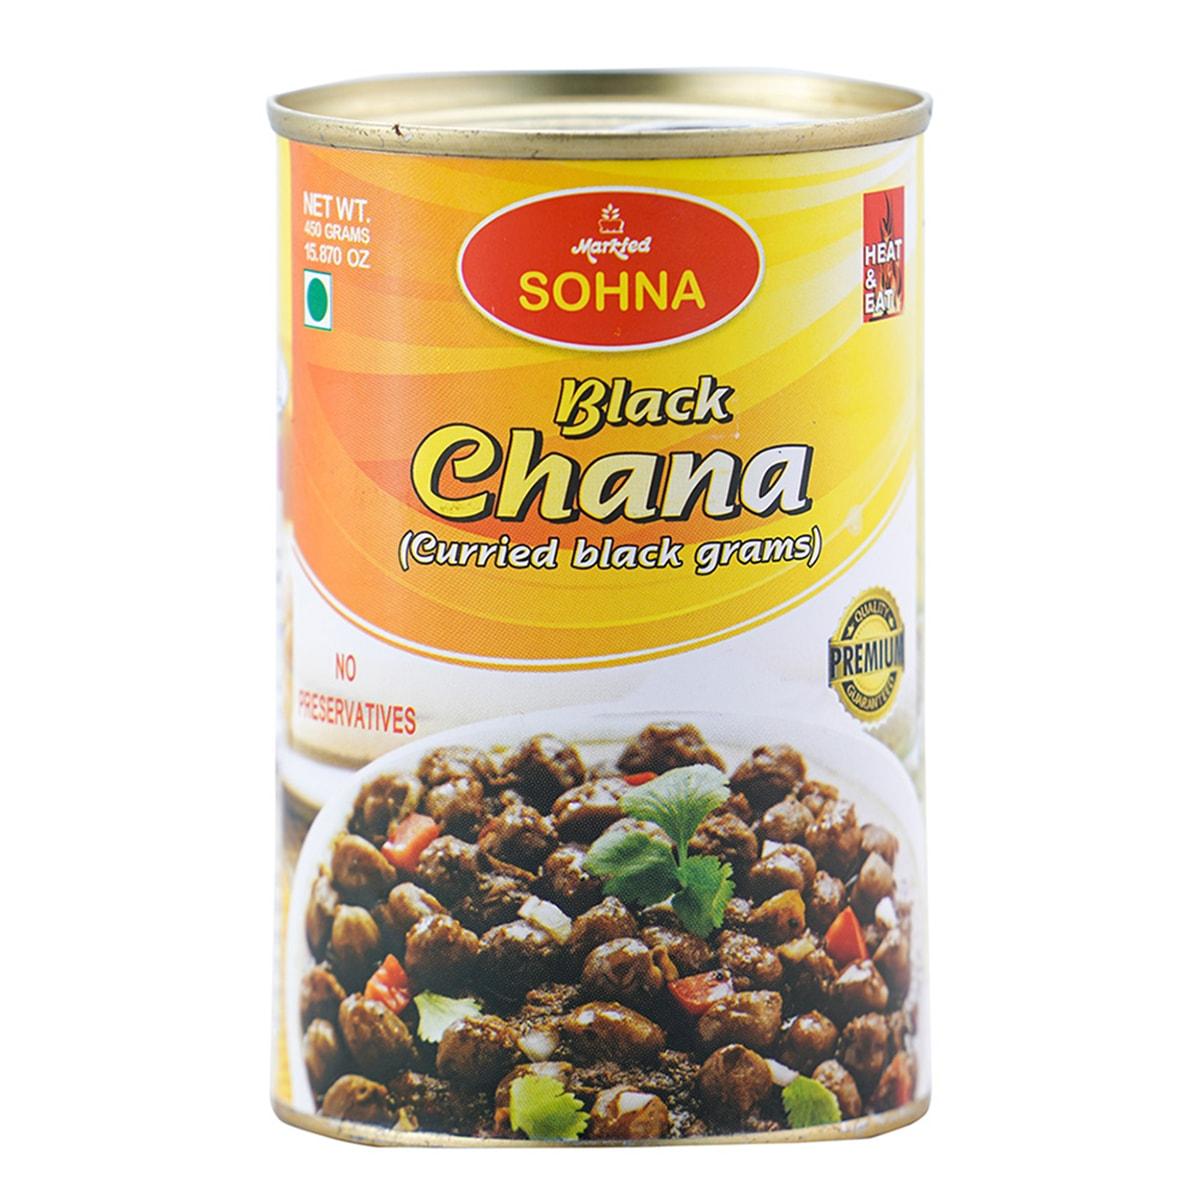 Buy Markfed Sohna Black Chana (Black Grams Curried) - 450 gm